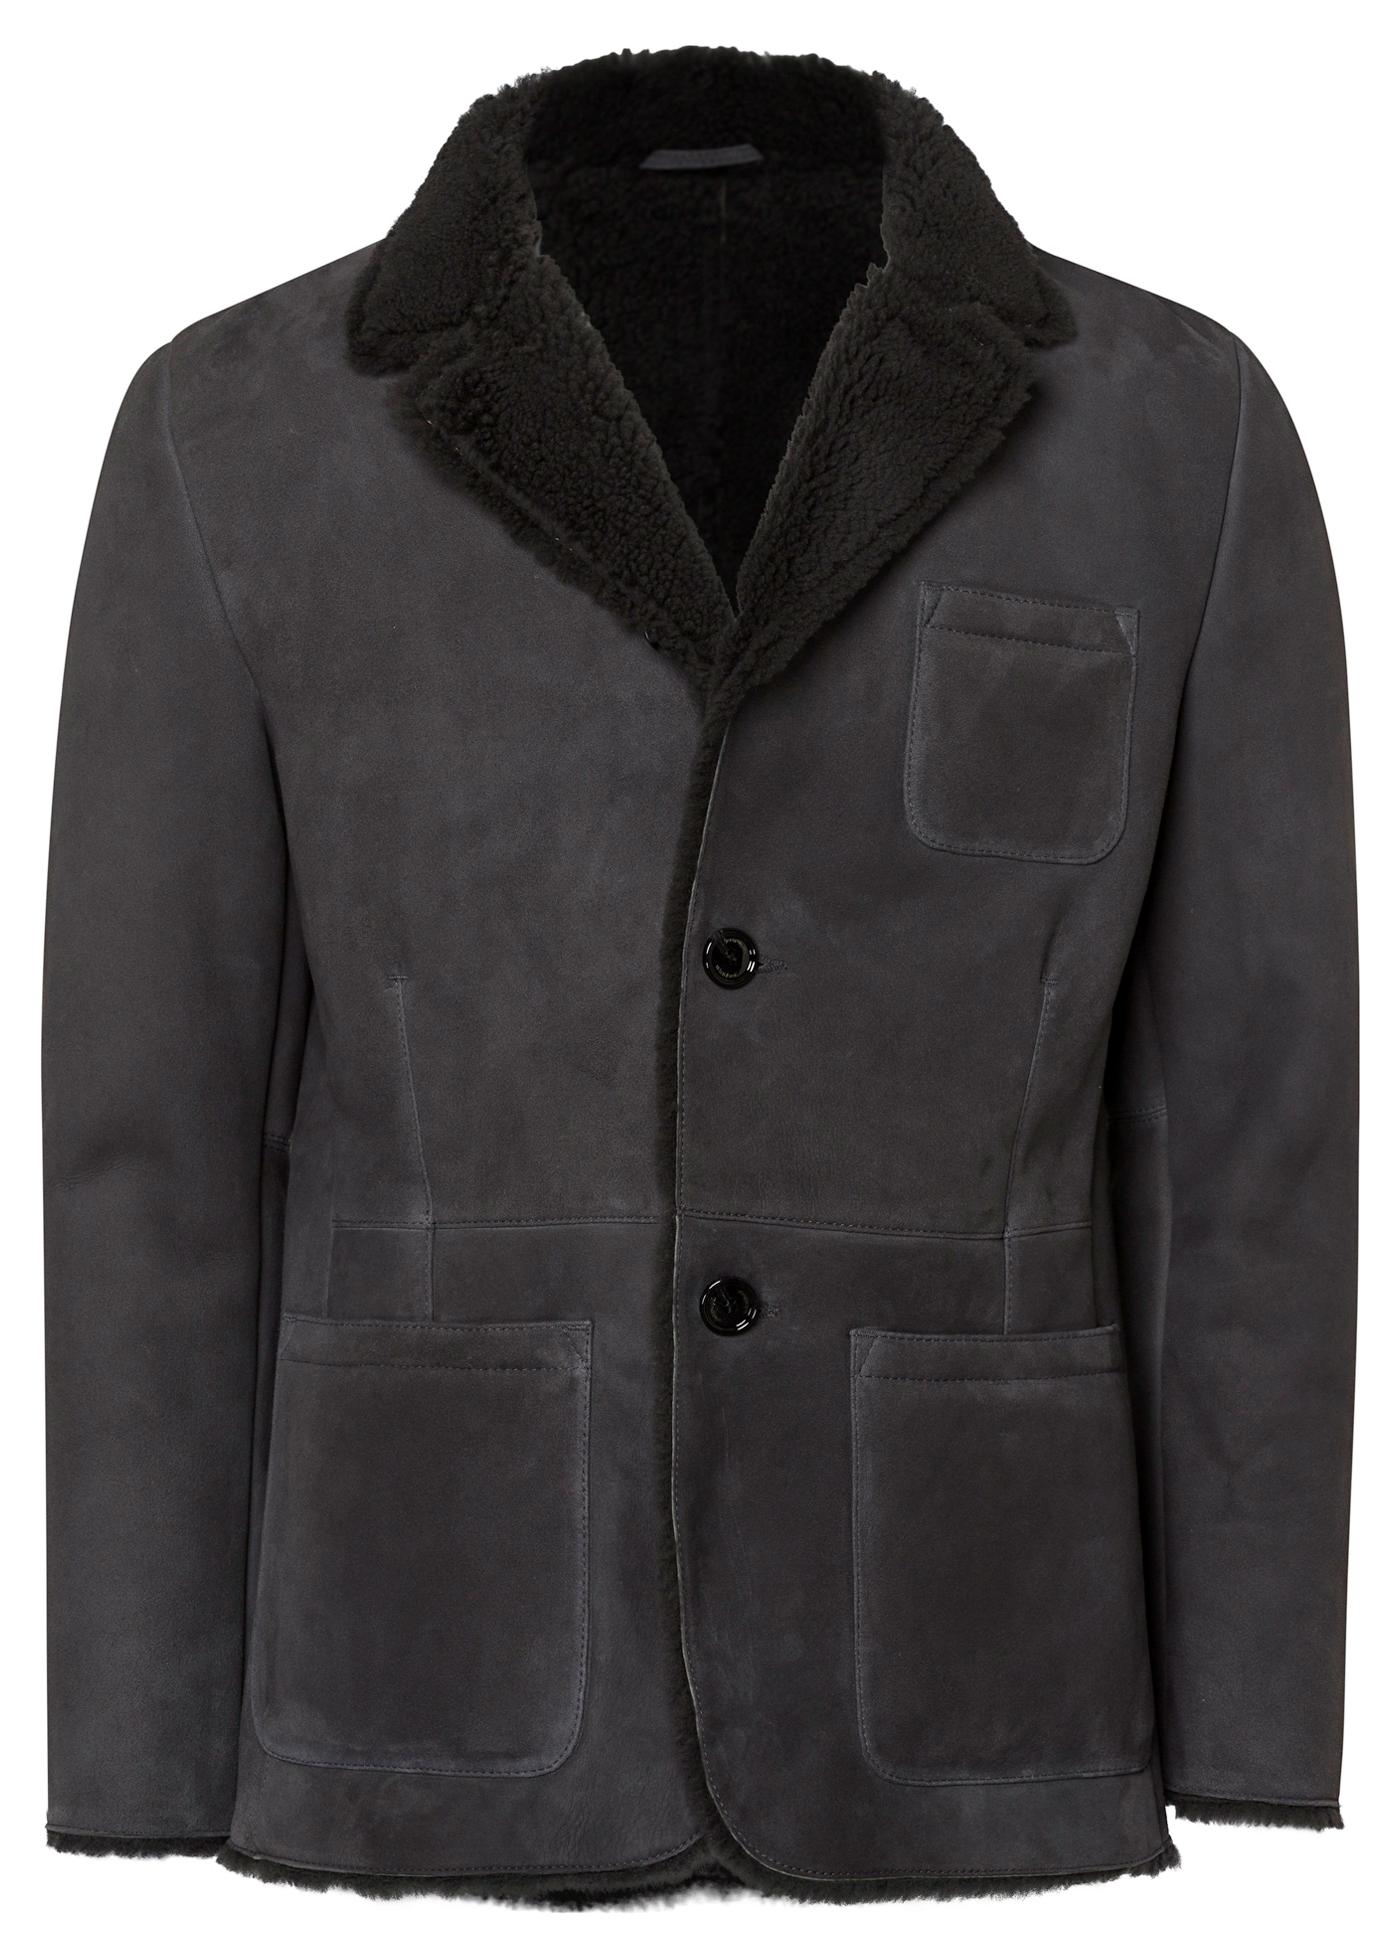 leather jacket Antola DF image number 0